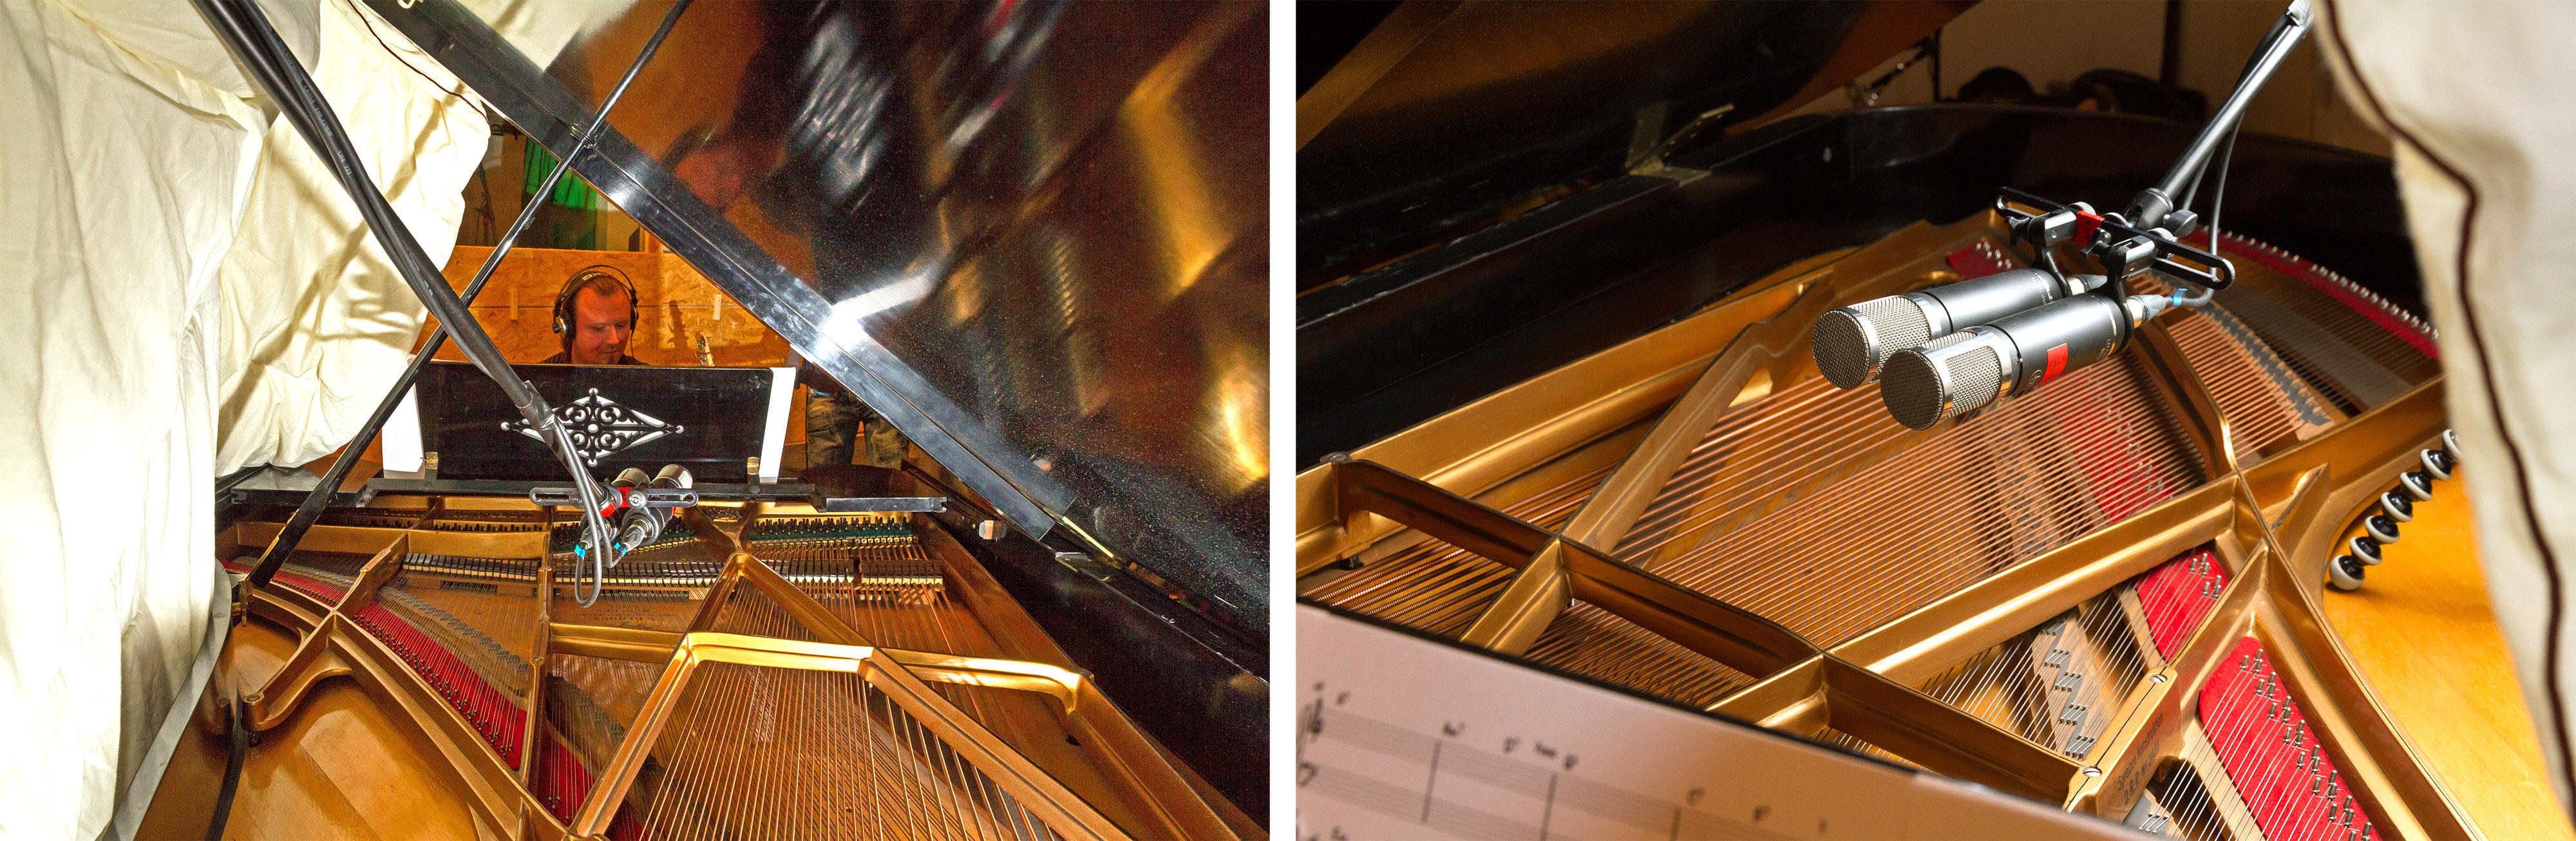 Microphone setup for grand piano